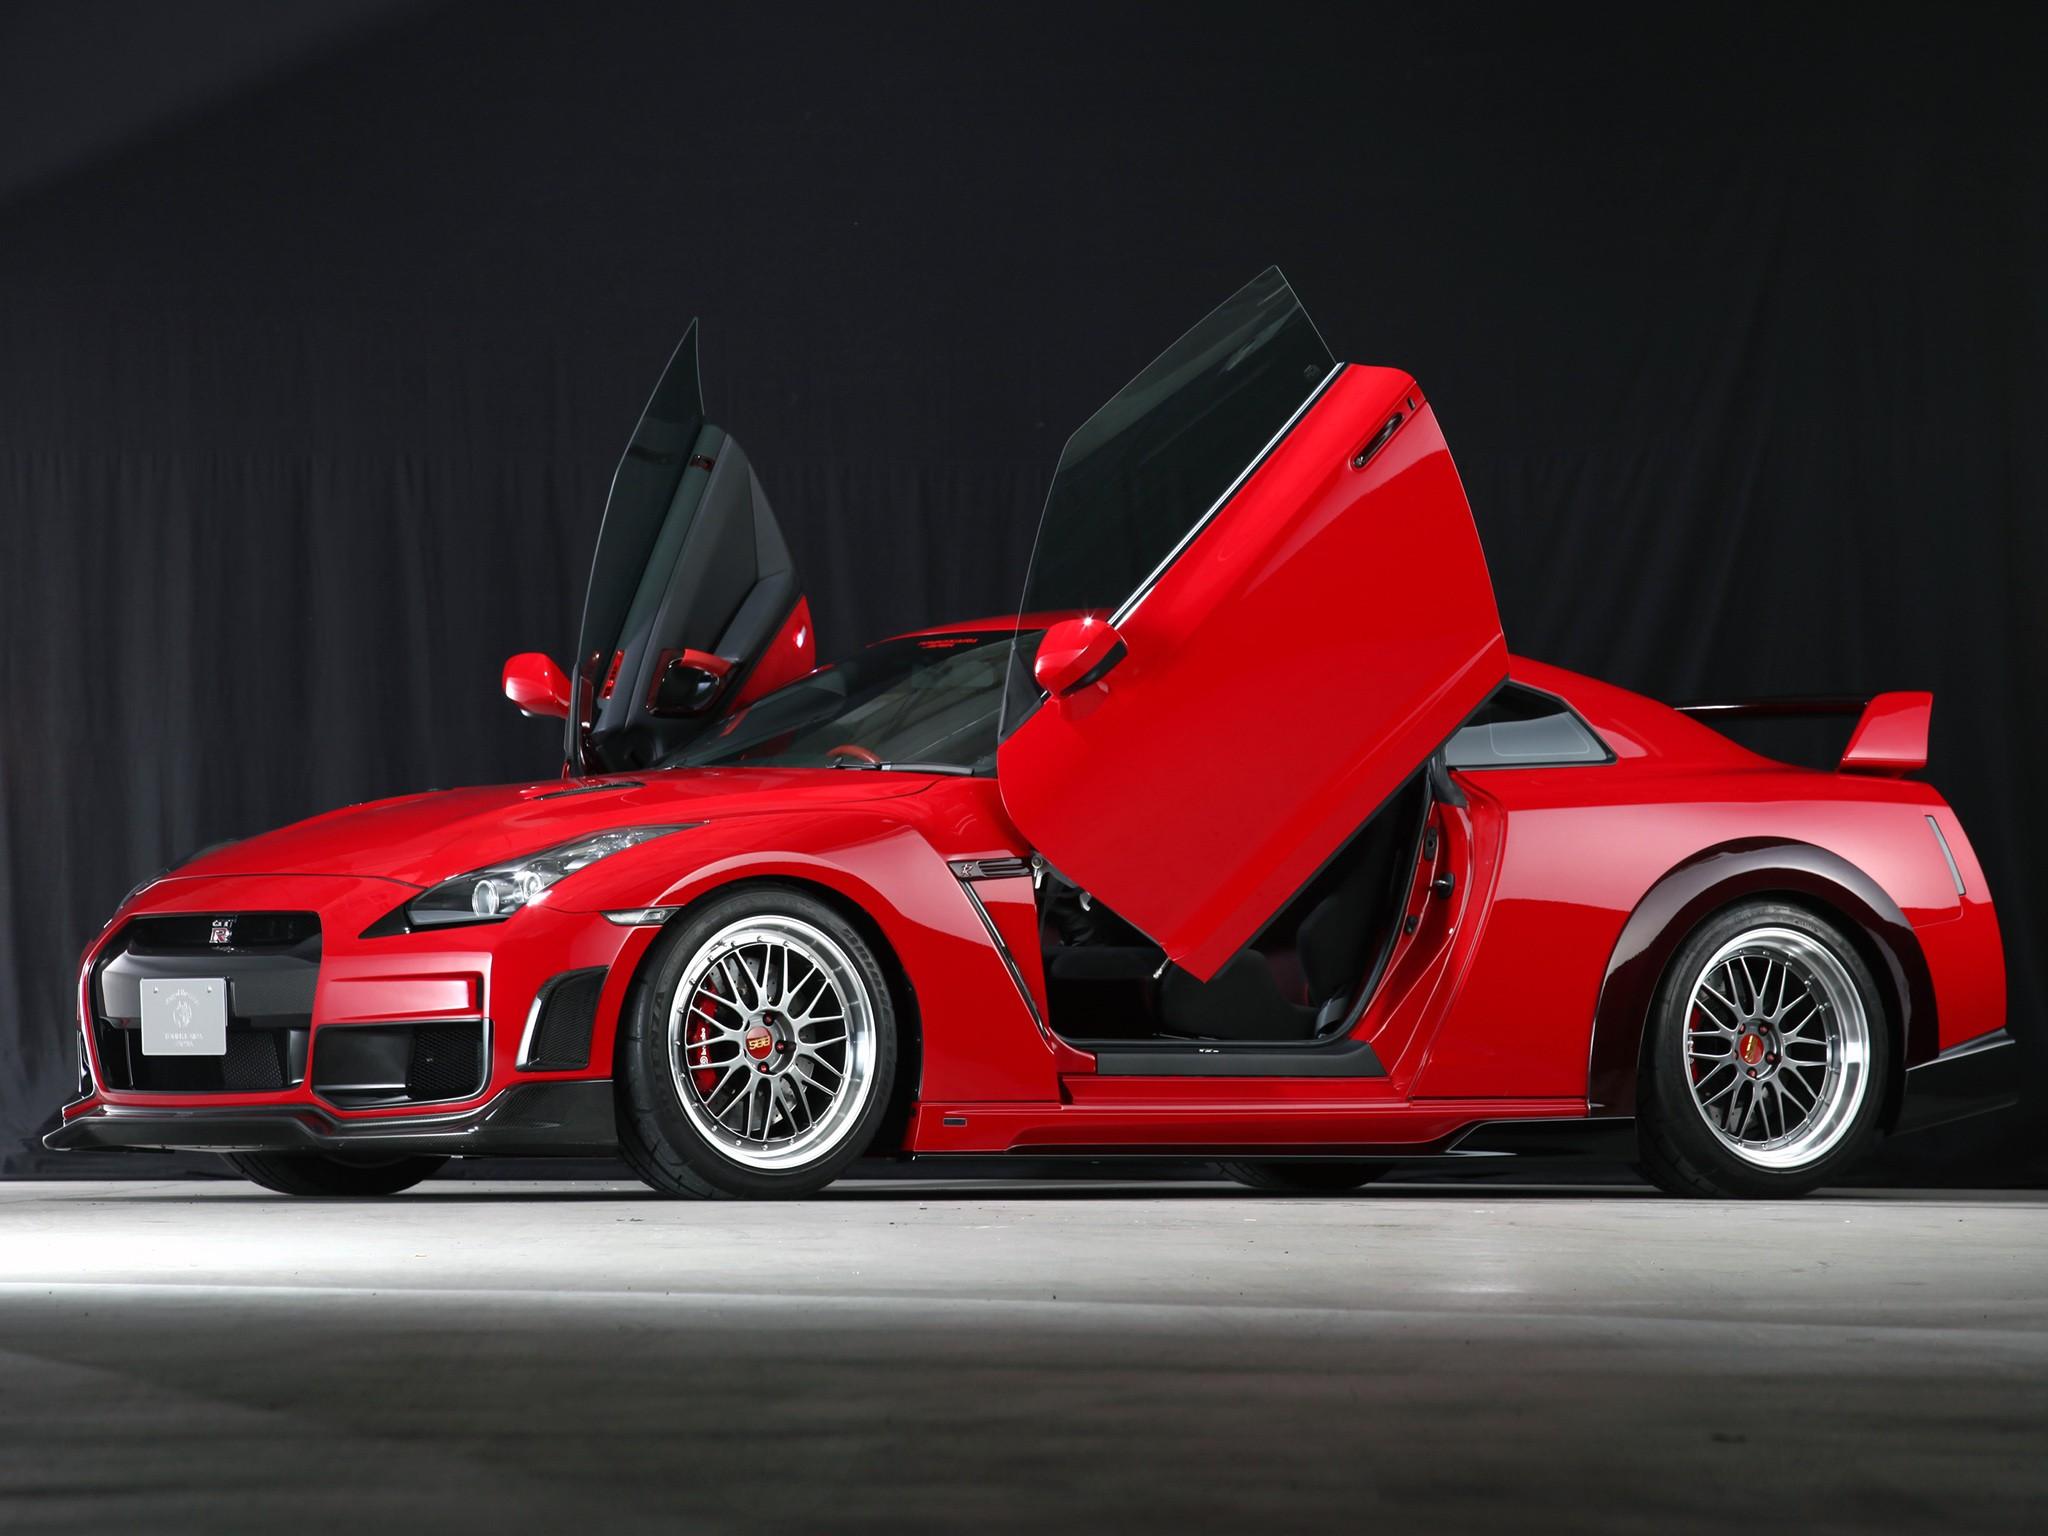 Red Cars Wallpaper 2048x1536 Red Cars Nissan Nissan Skyline GTR 2048x1536